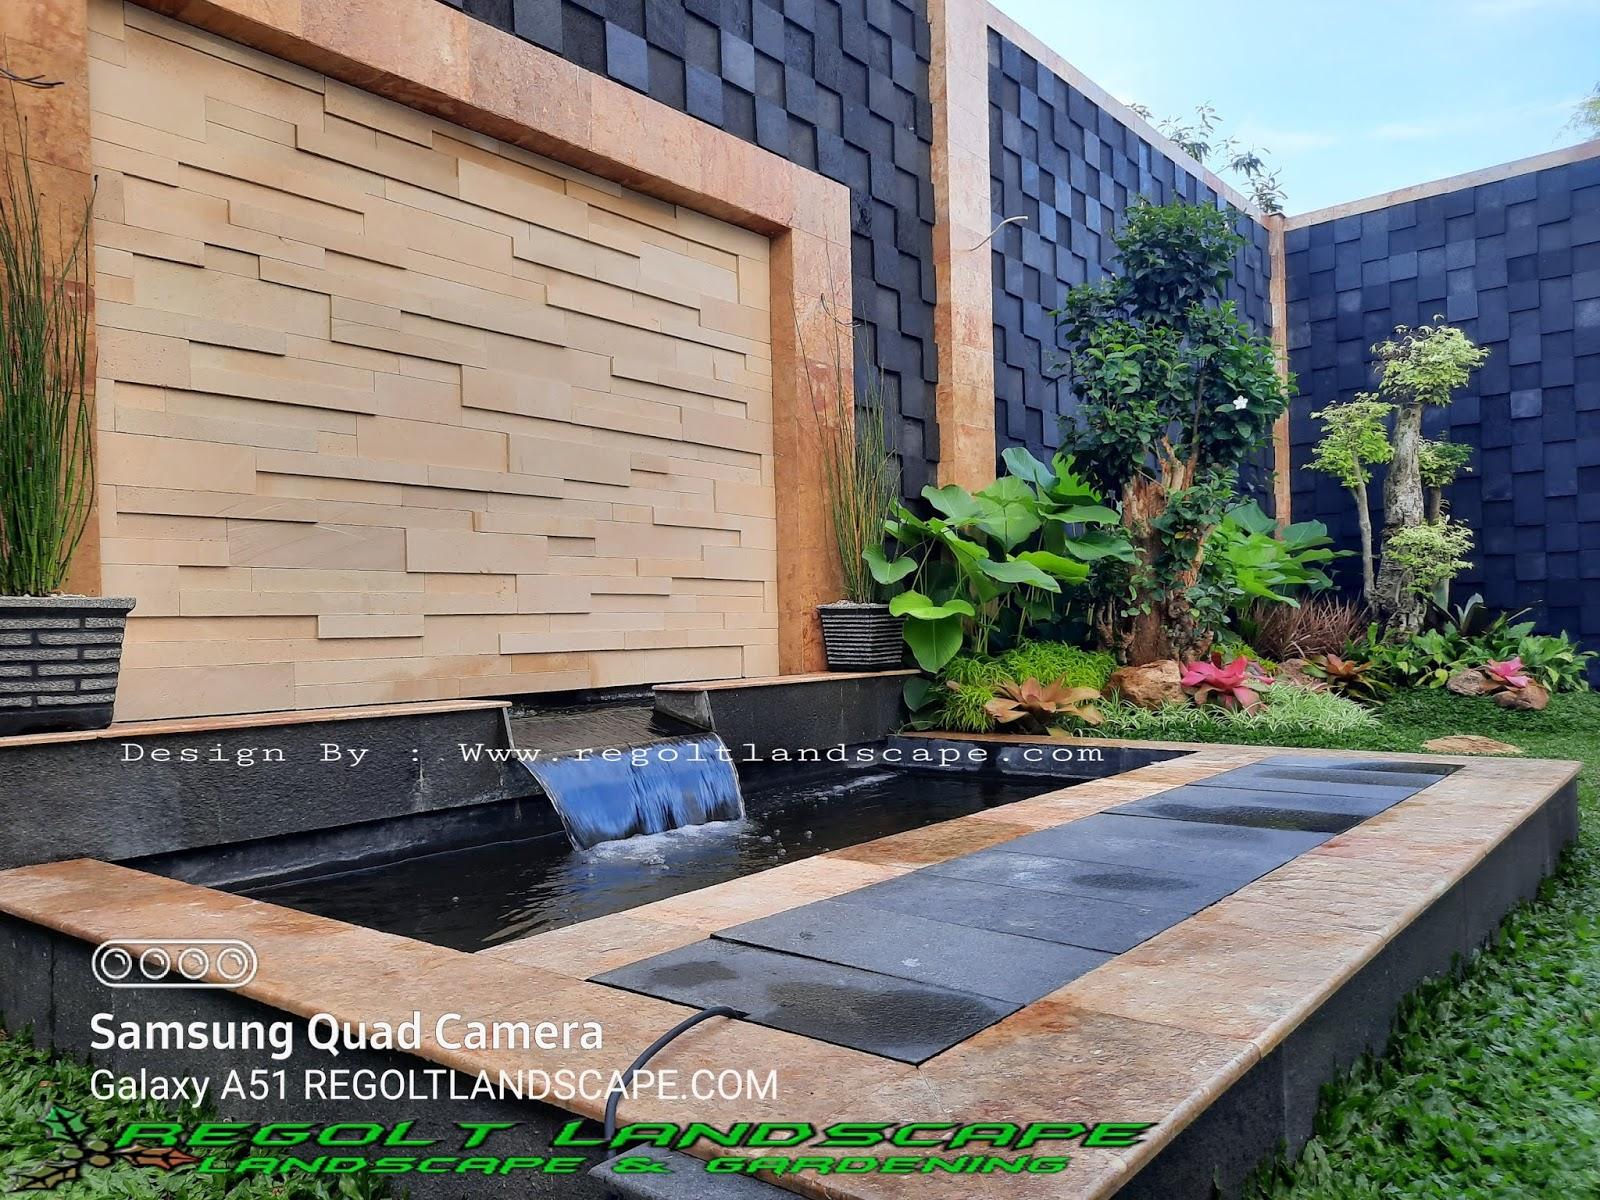 Tukang Kolam Minimalis - Koi Jakarta Timur, Barat, Selatan, Utara, Pusat